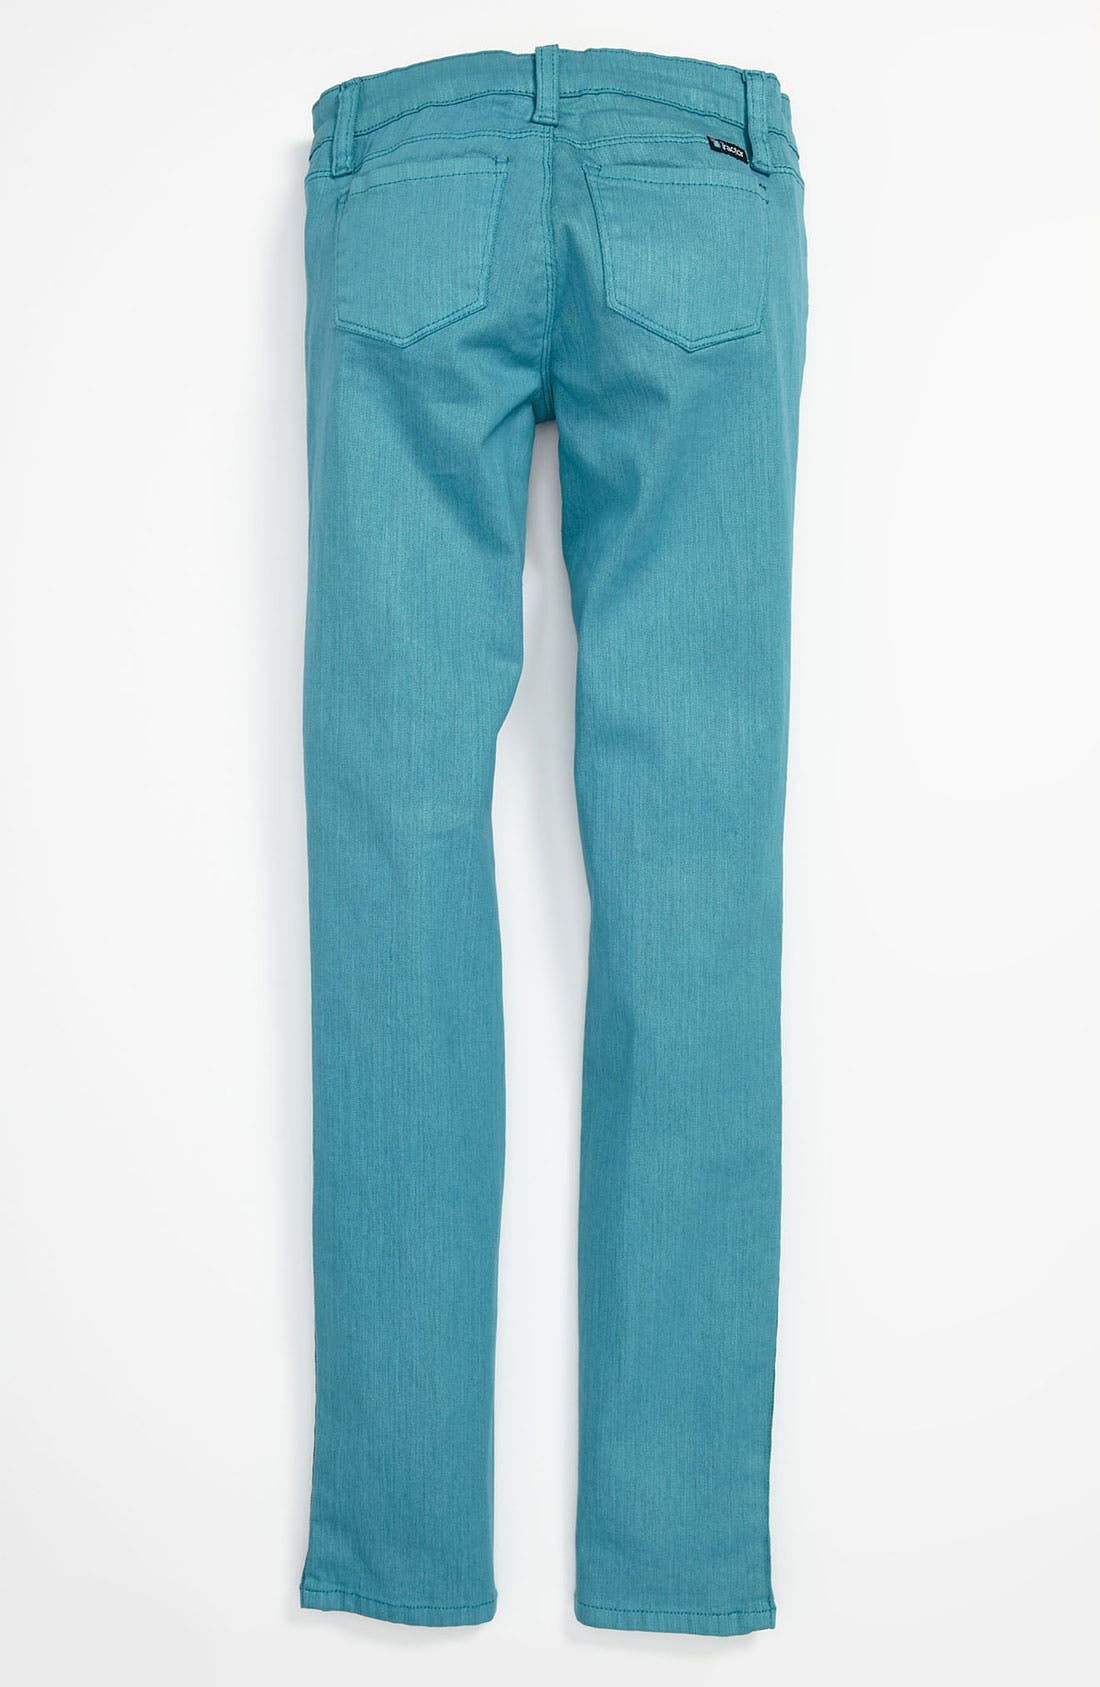 Main Image - Tractr Coated Denim Skinny Leg Jeans (Big Girls)